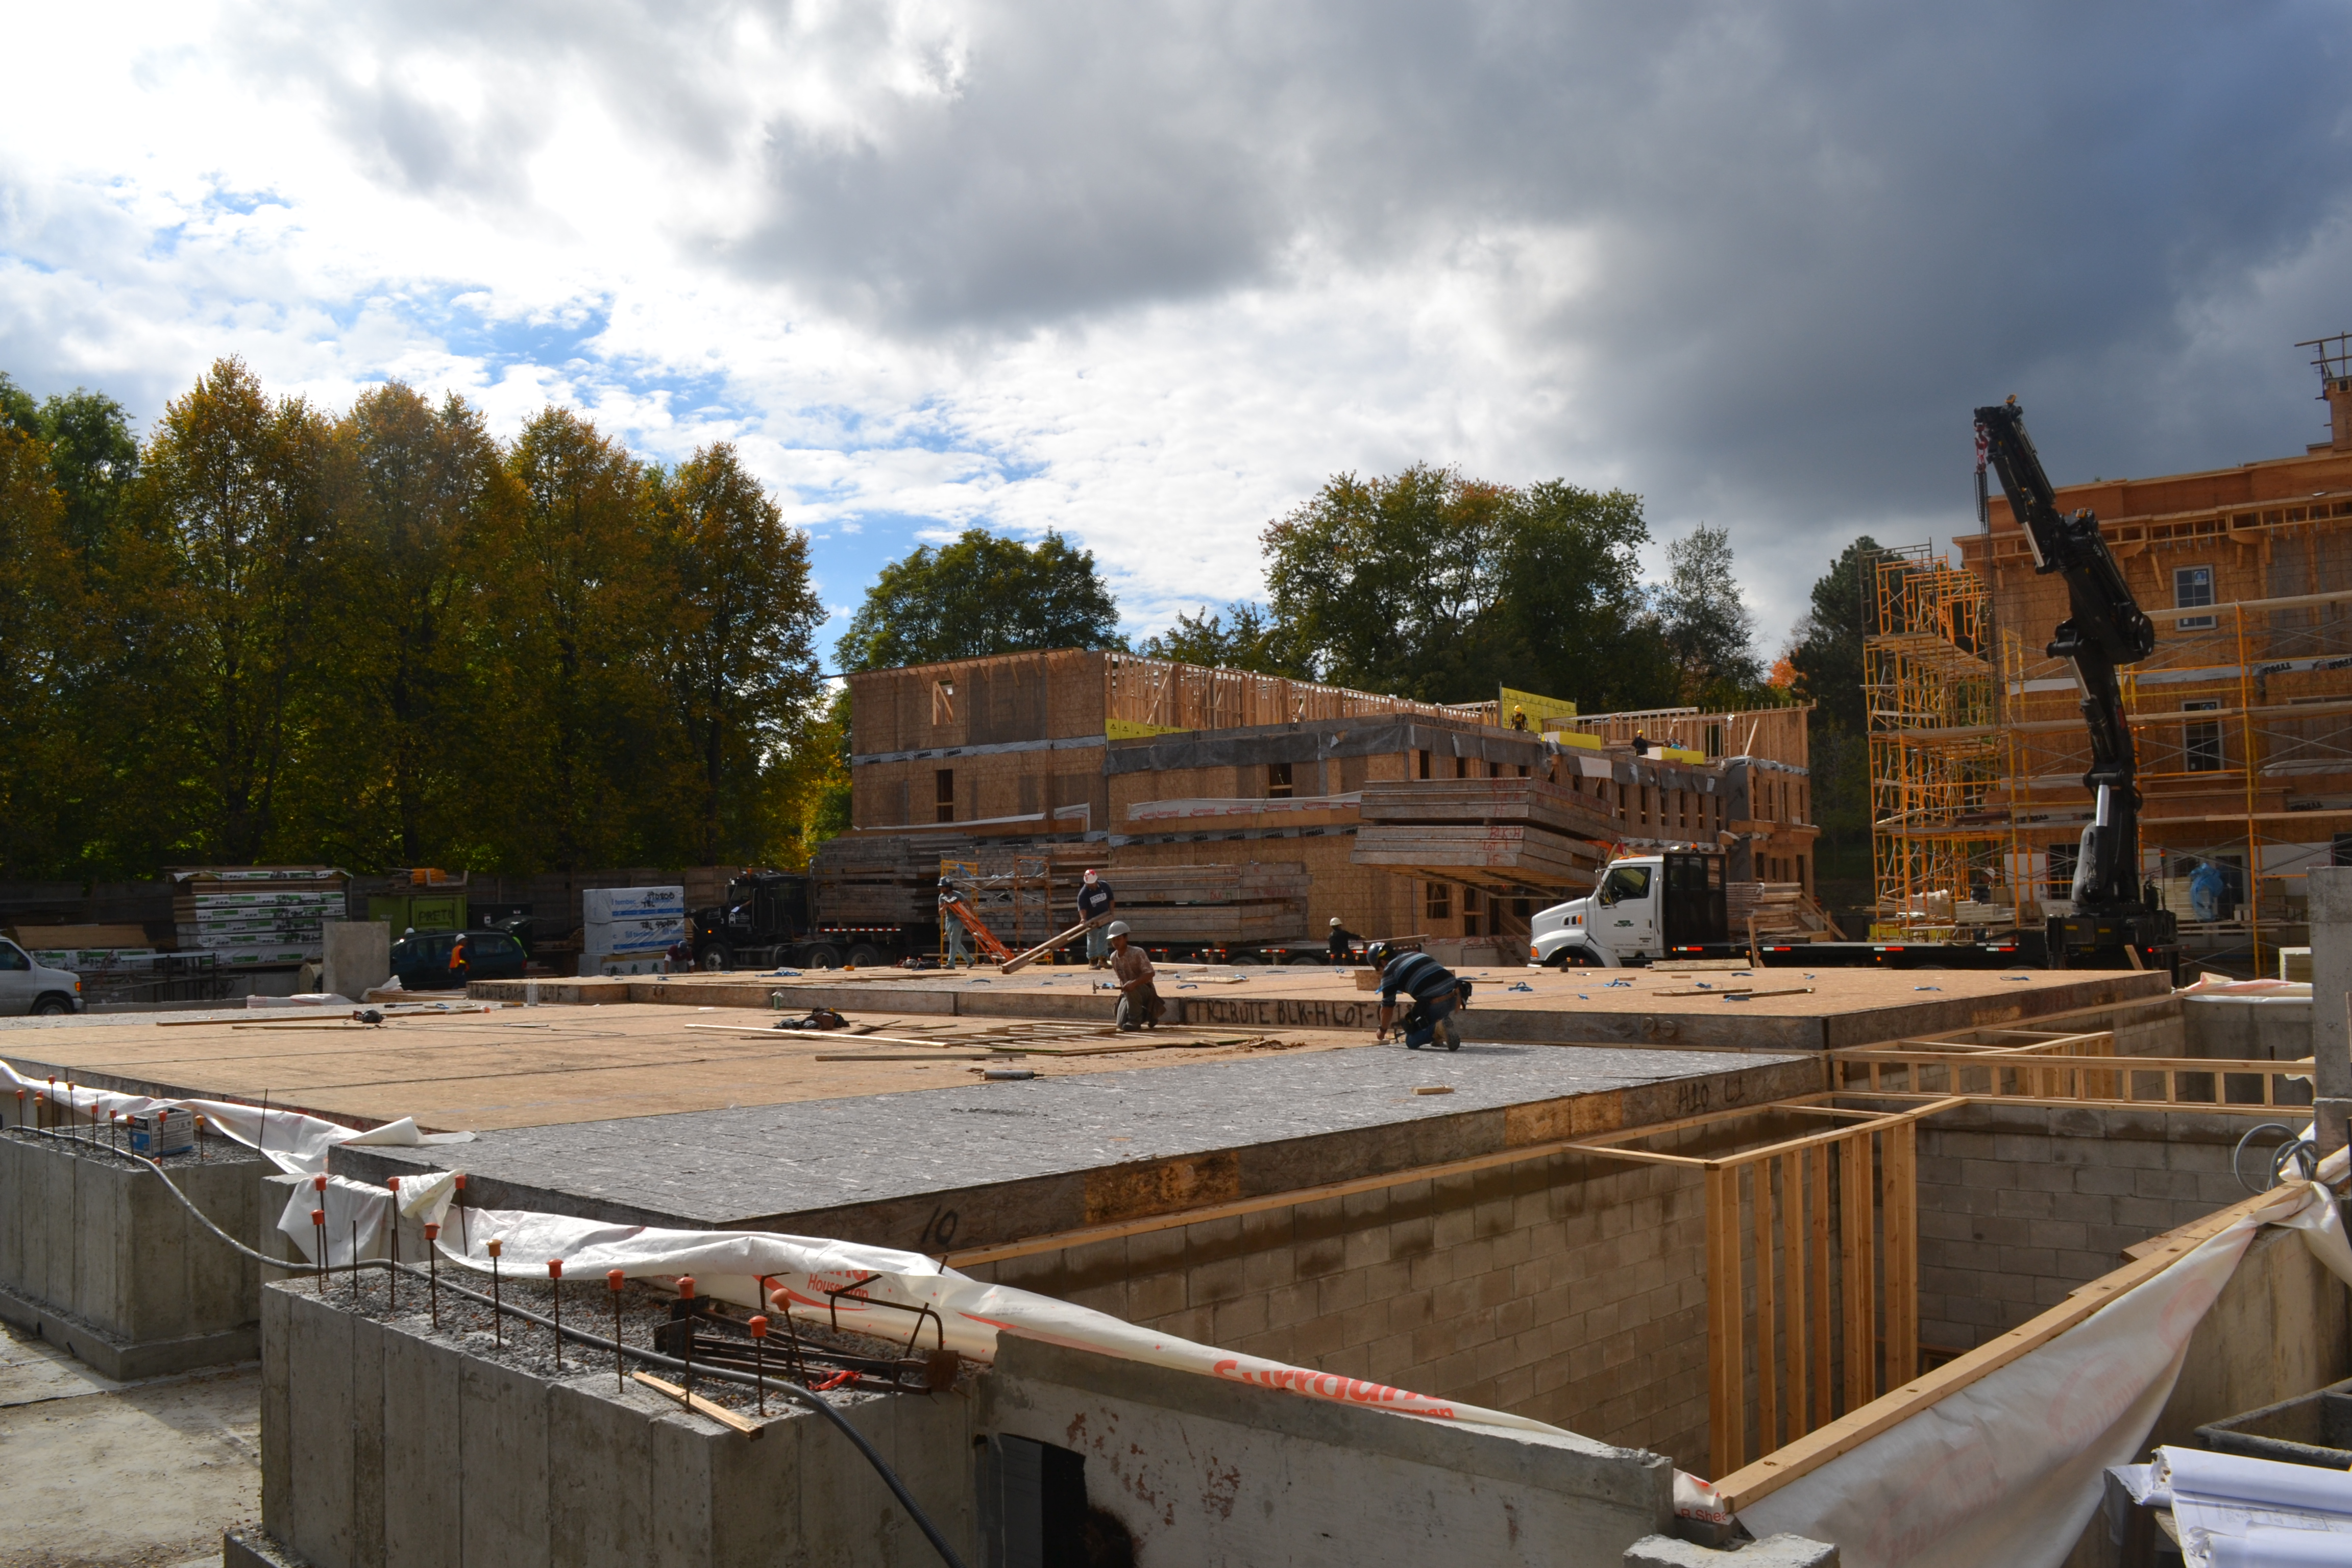 canterbury lawrence park construction site